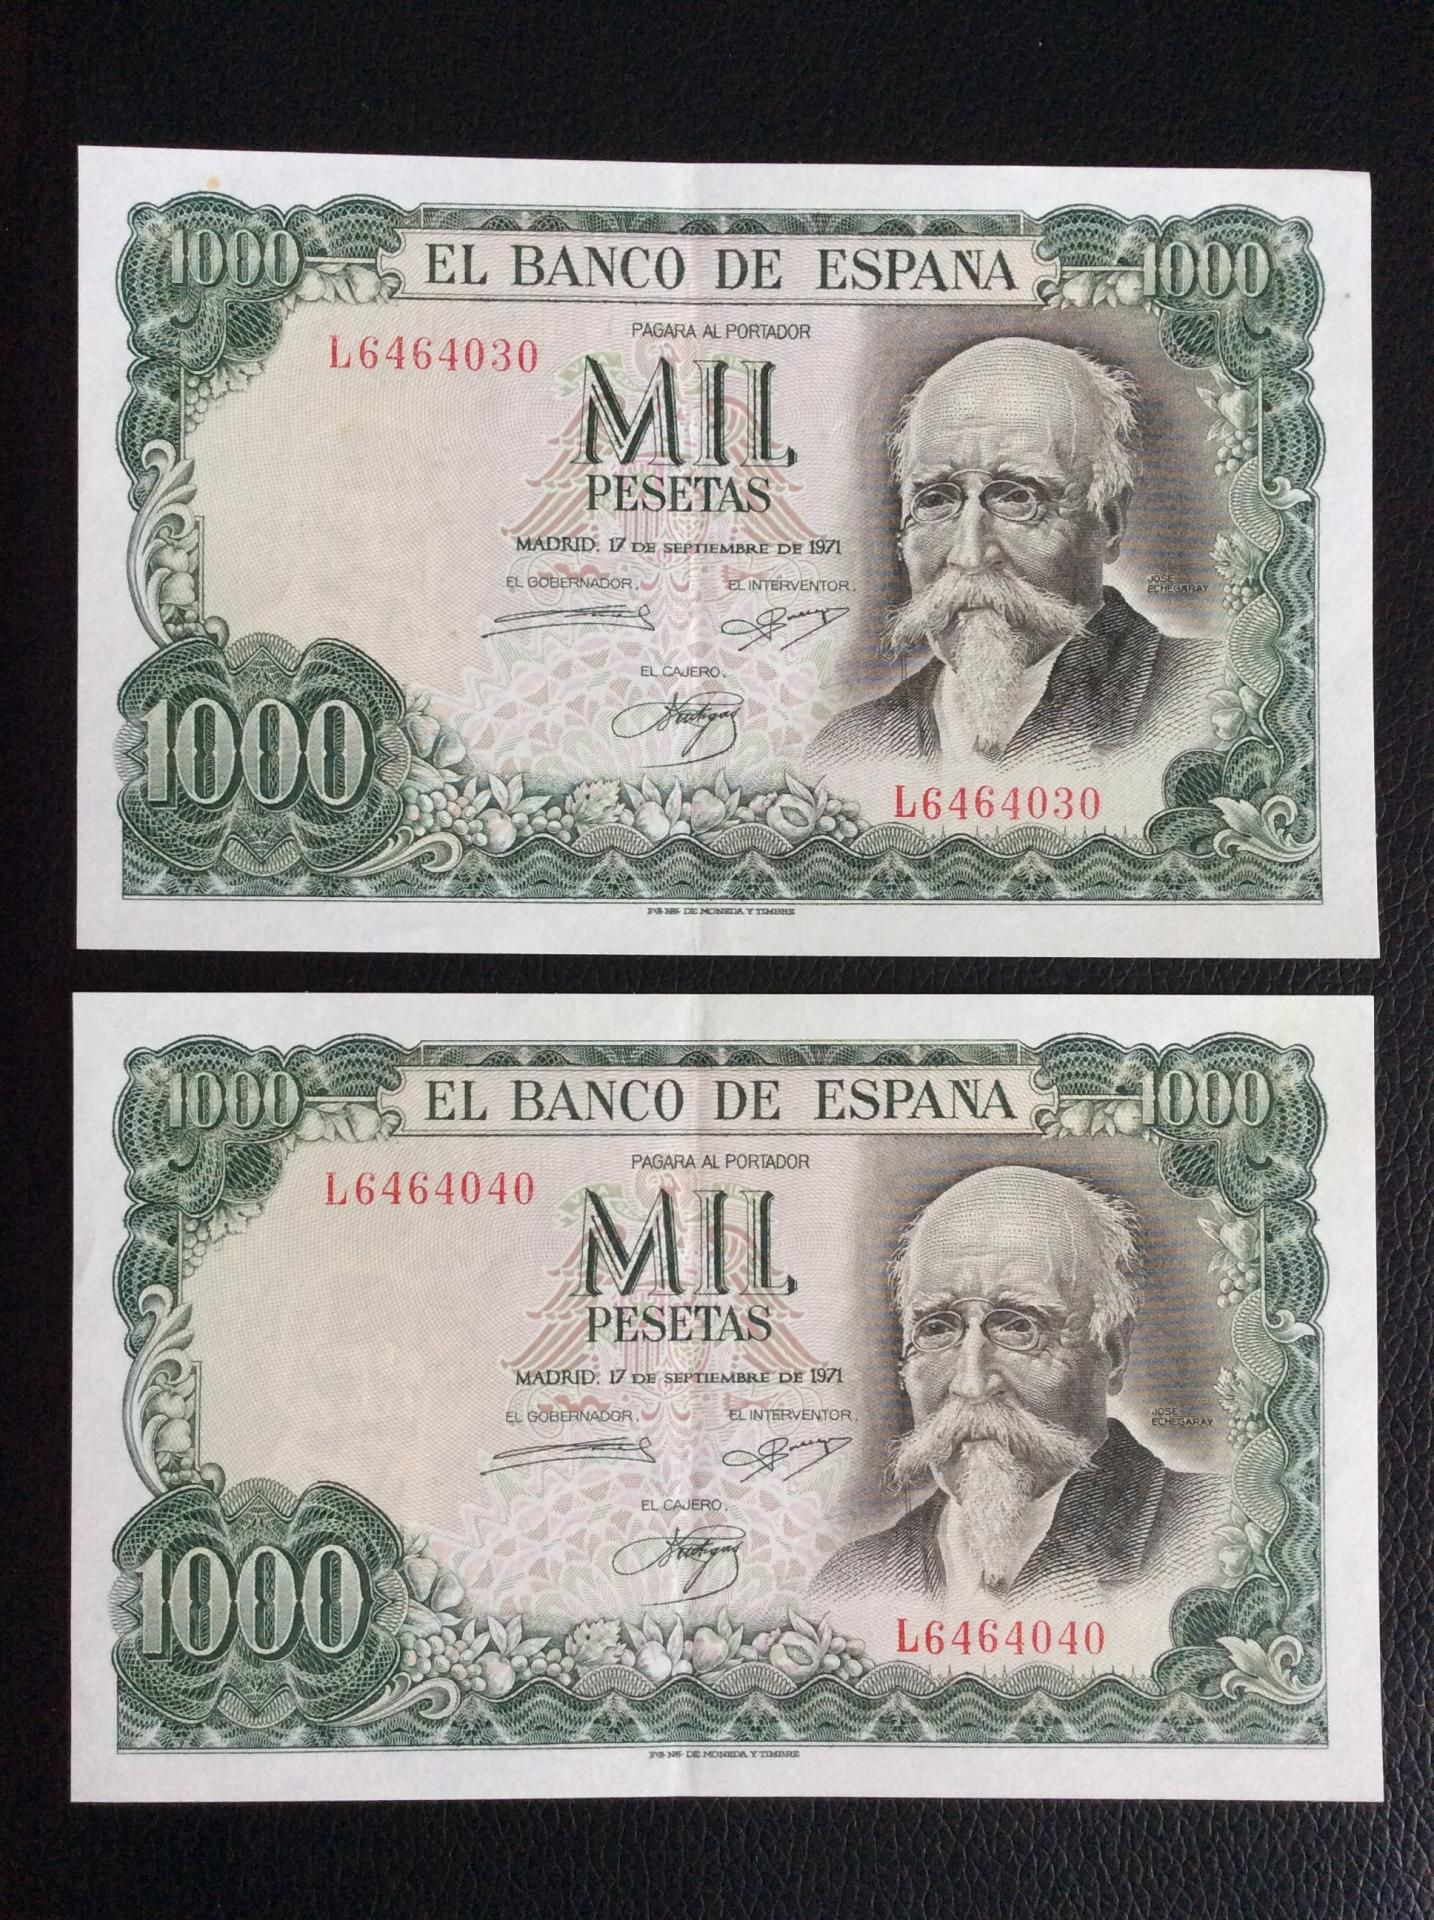 1000 PESETAS 1971 - JOSÉ ECHEGARAY - PAREJA